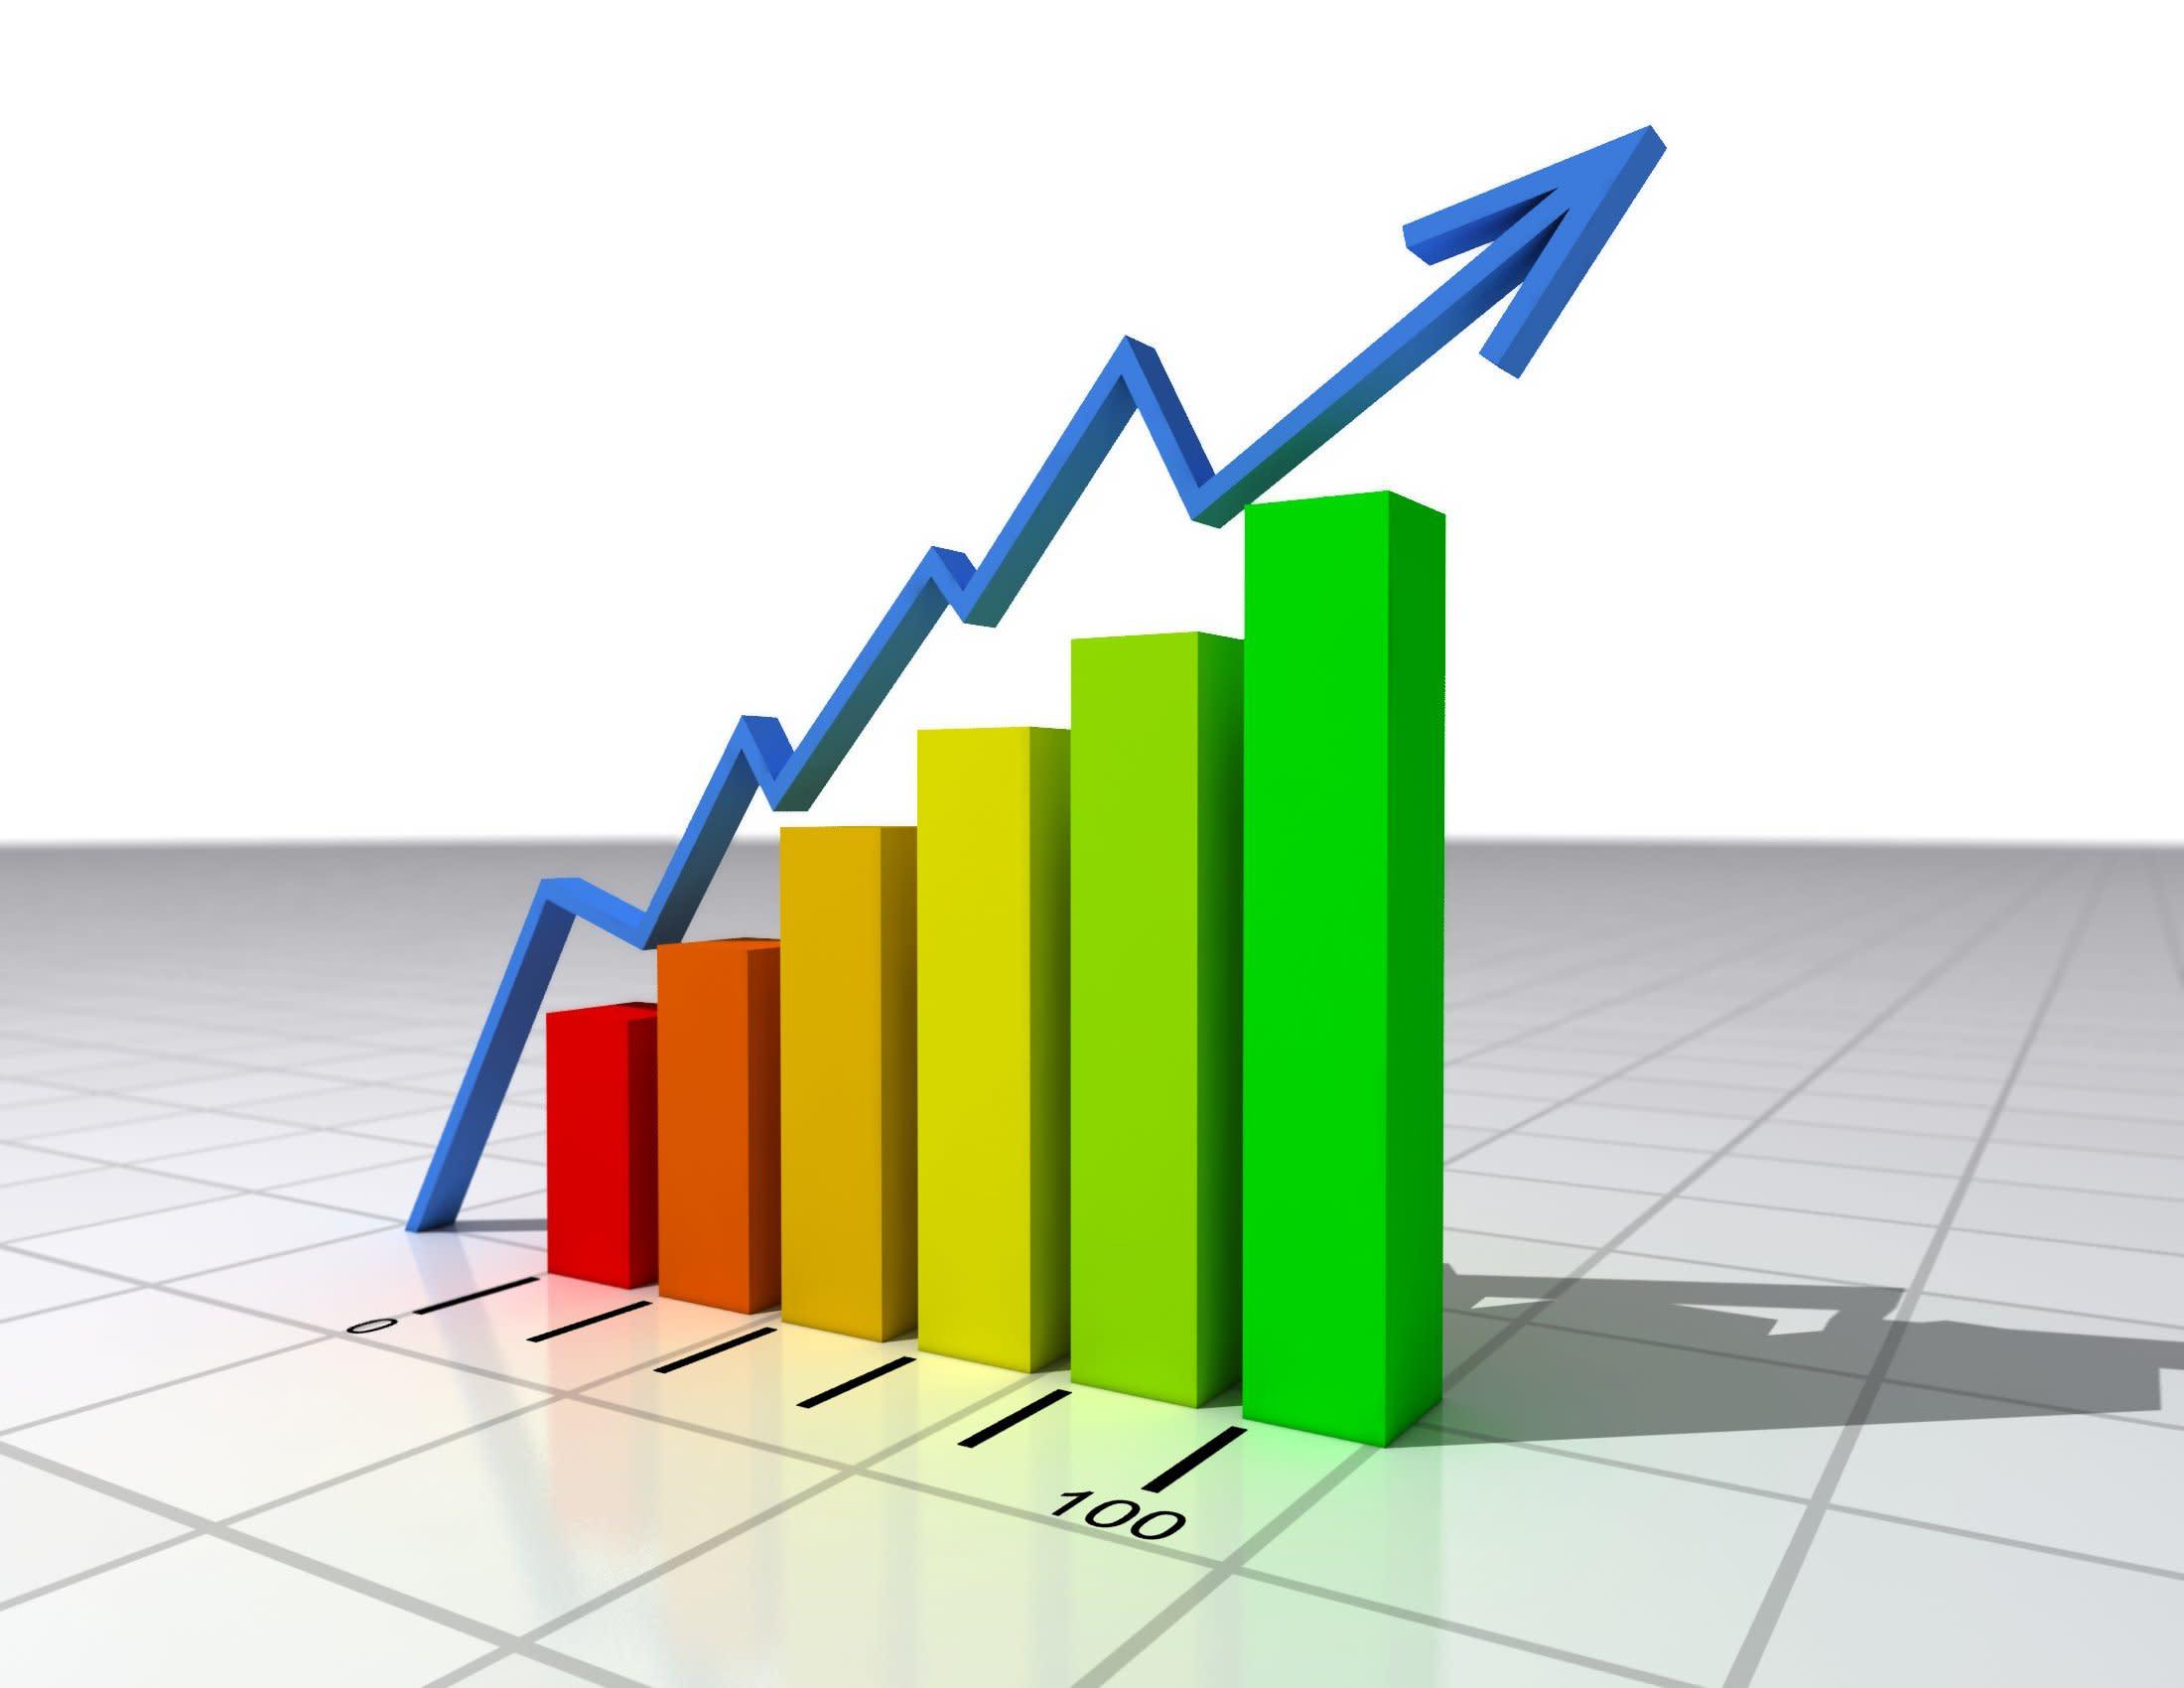 Growing-rate-graph_ils5k0.jpg